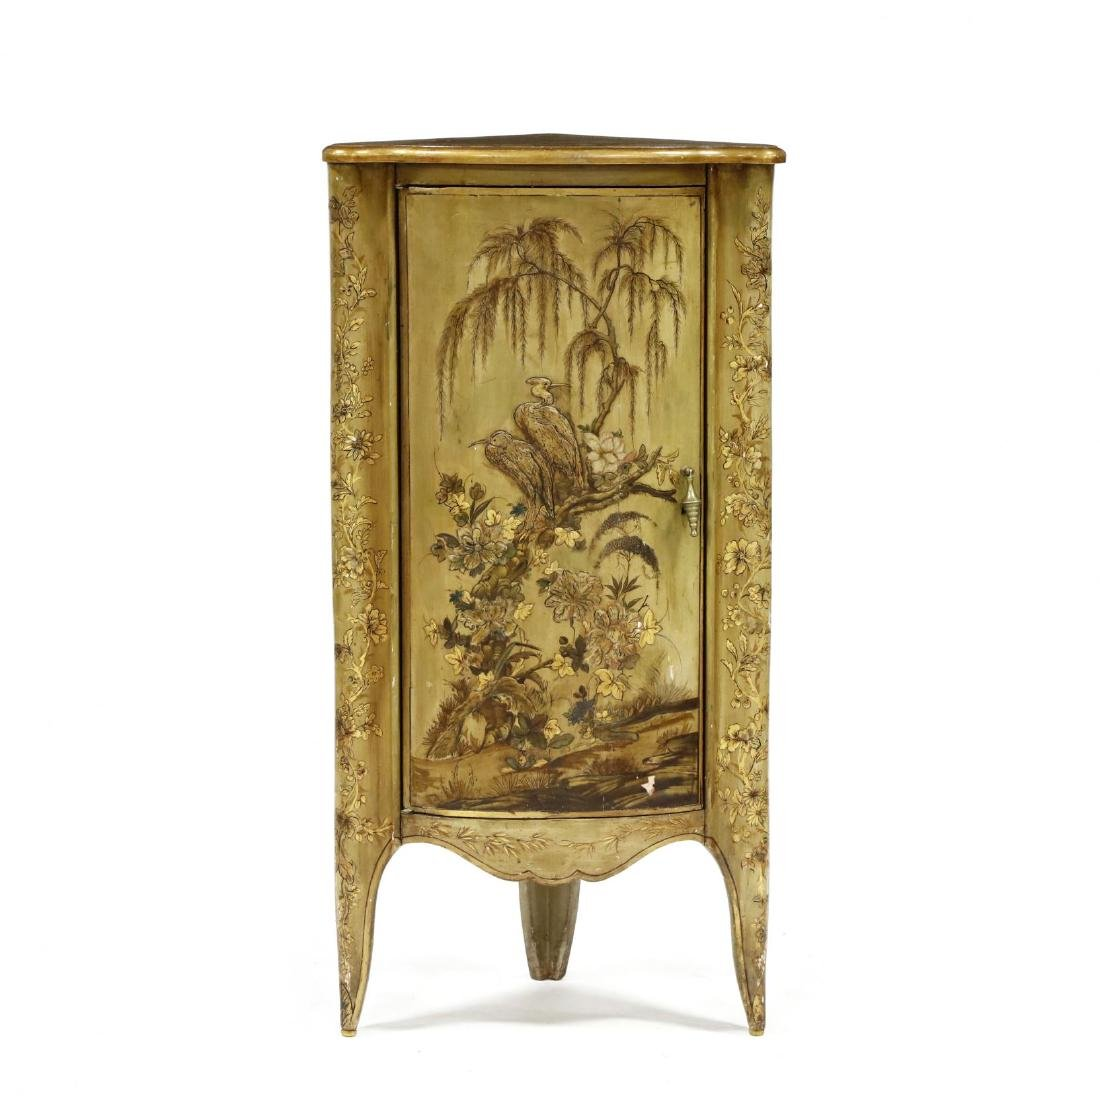 Chinoiserie Decorated Diminutive Corner Cabinet